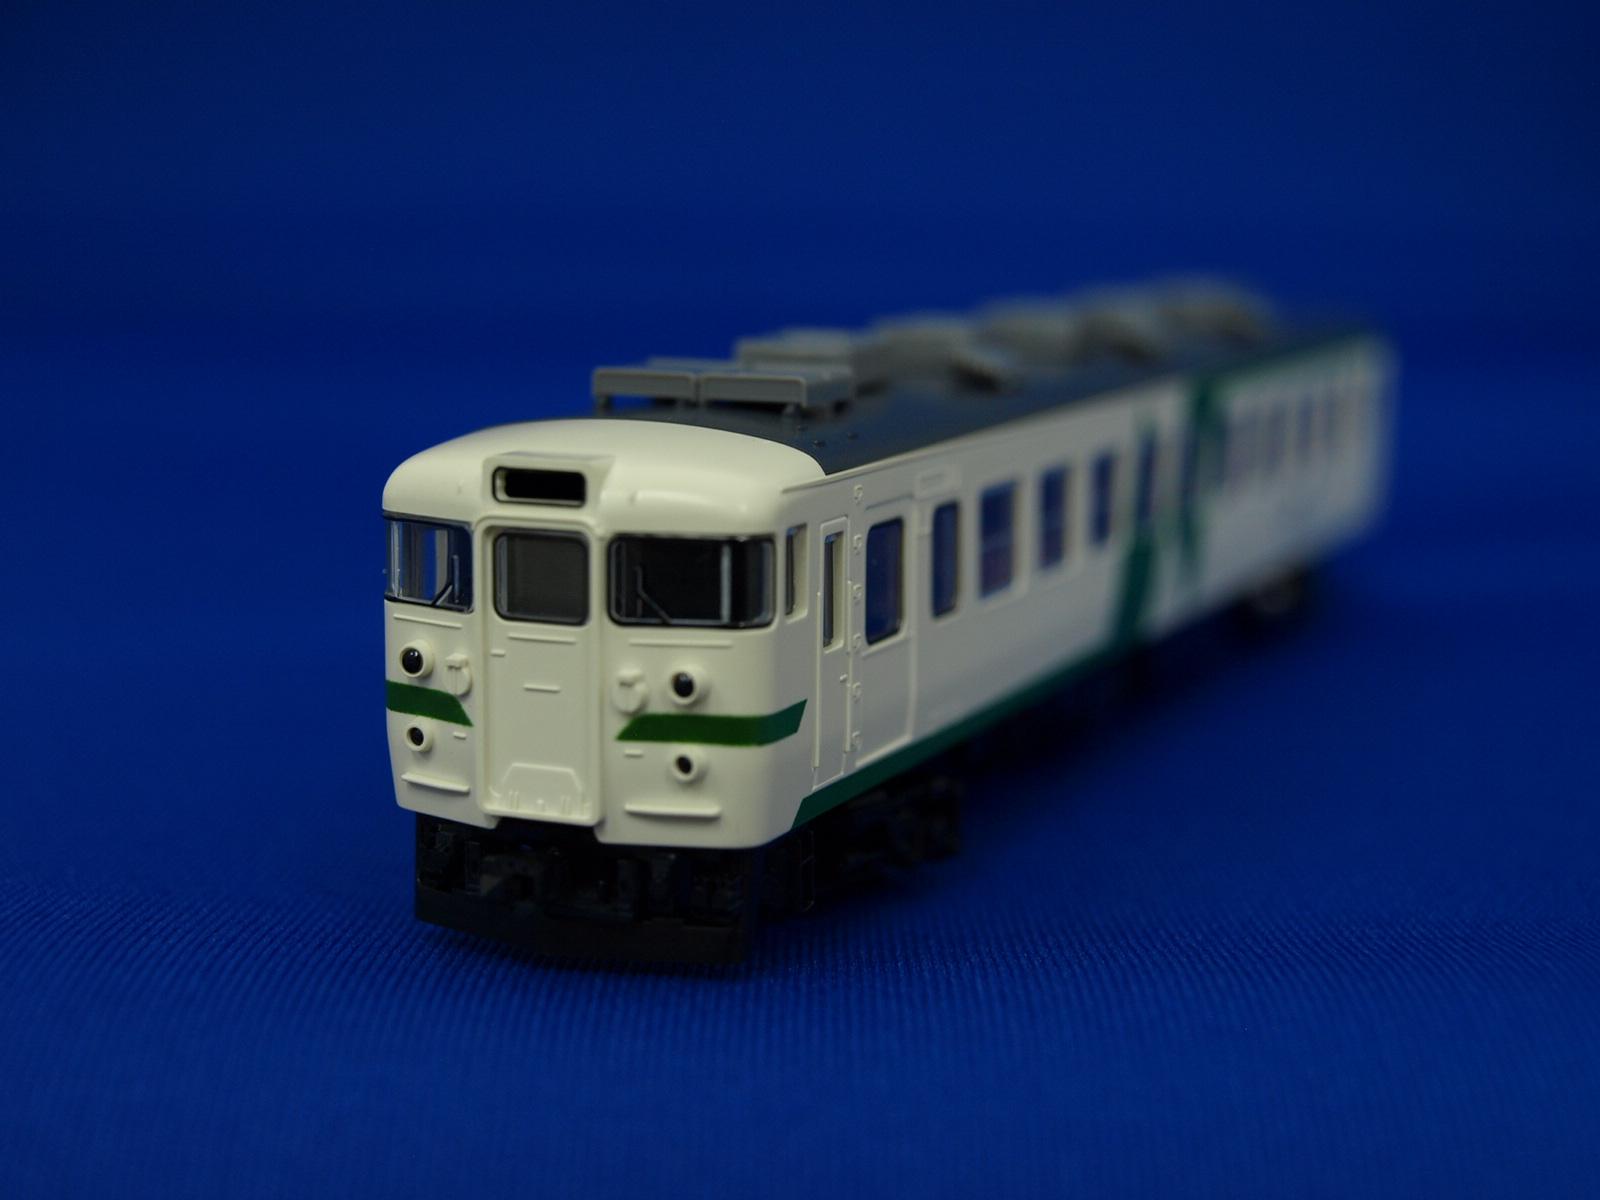 Nゲージ トミックス 98293 JR 169系電車(松本運転所・改座車)基本3両セット